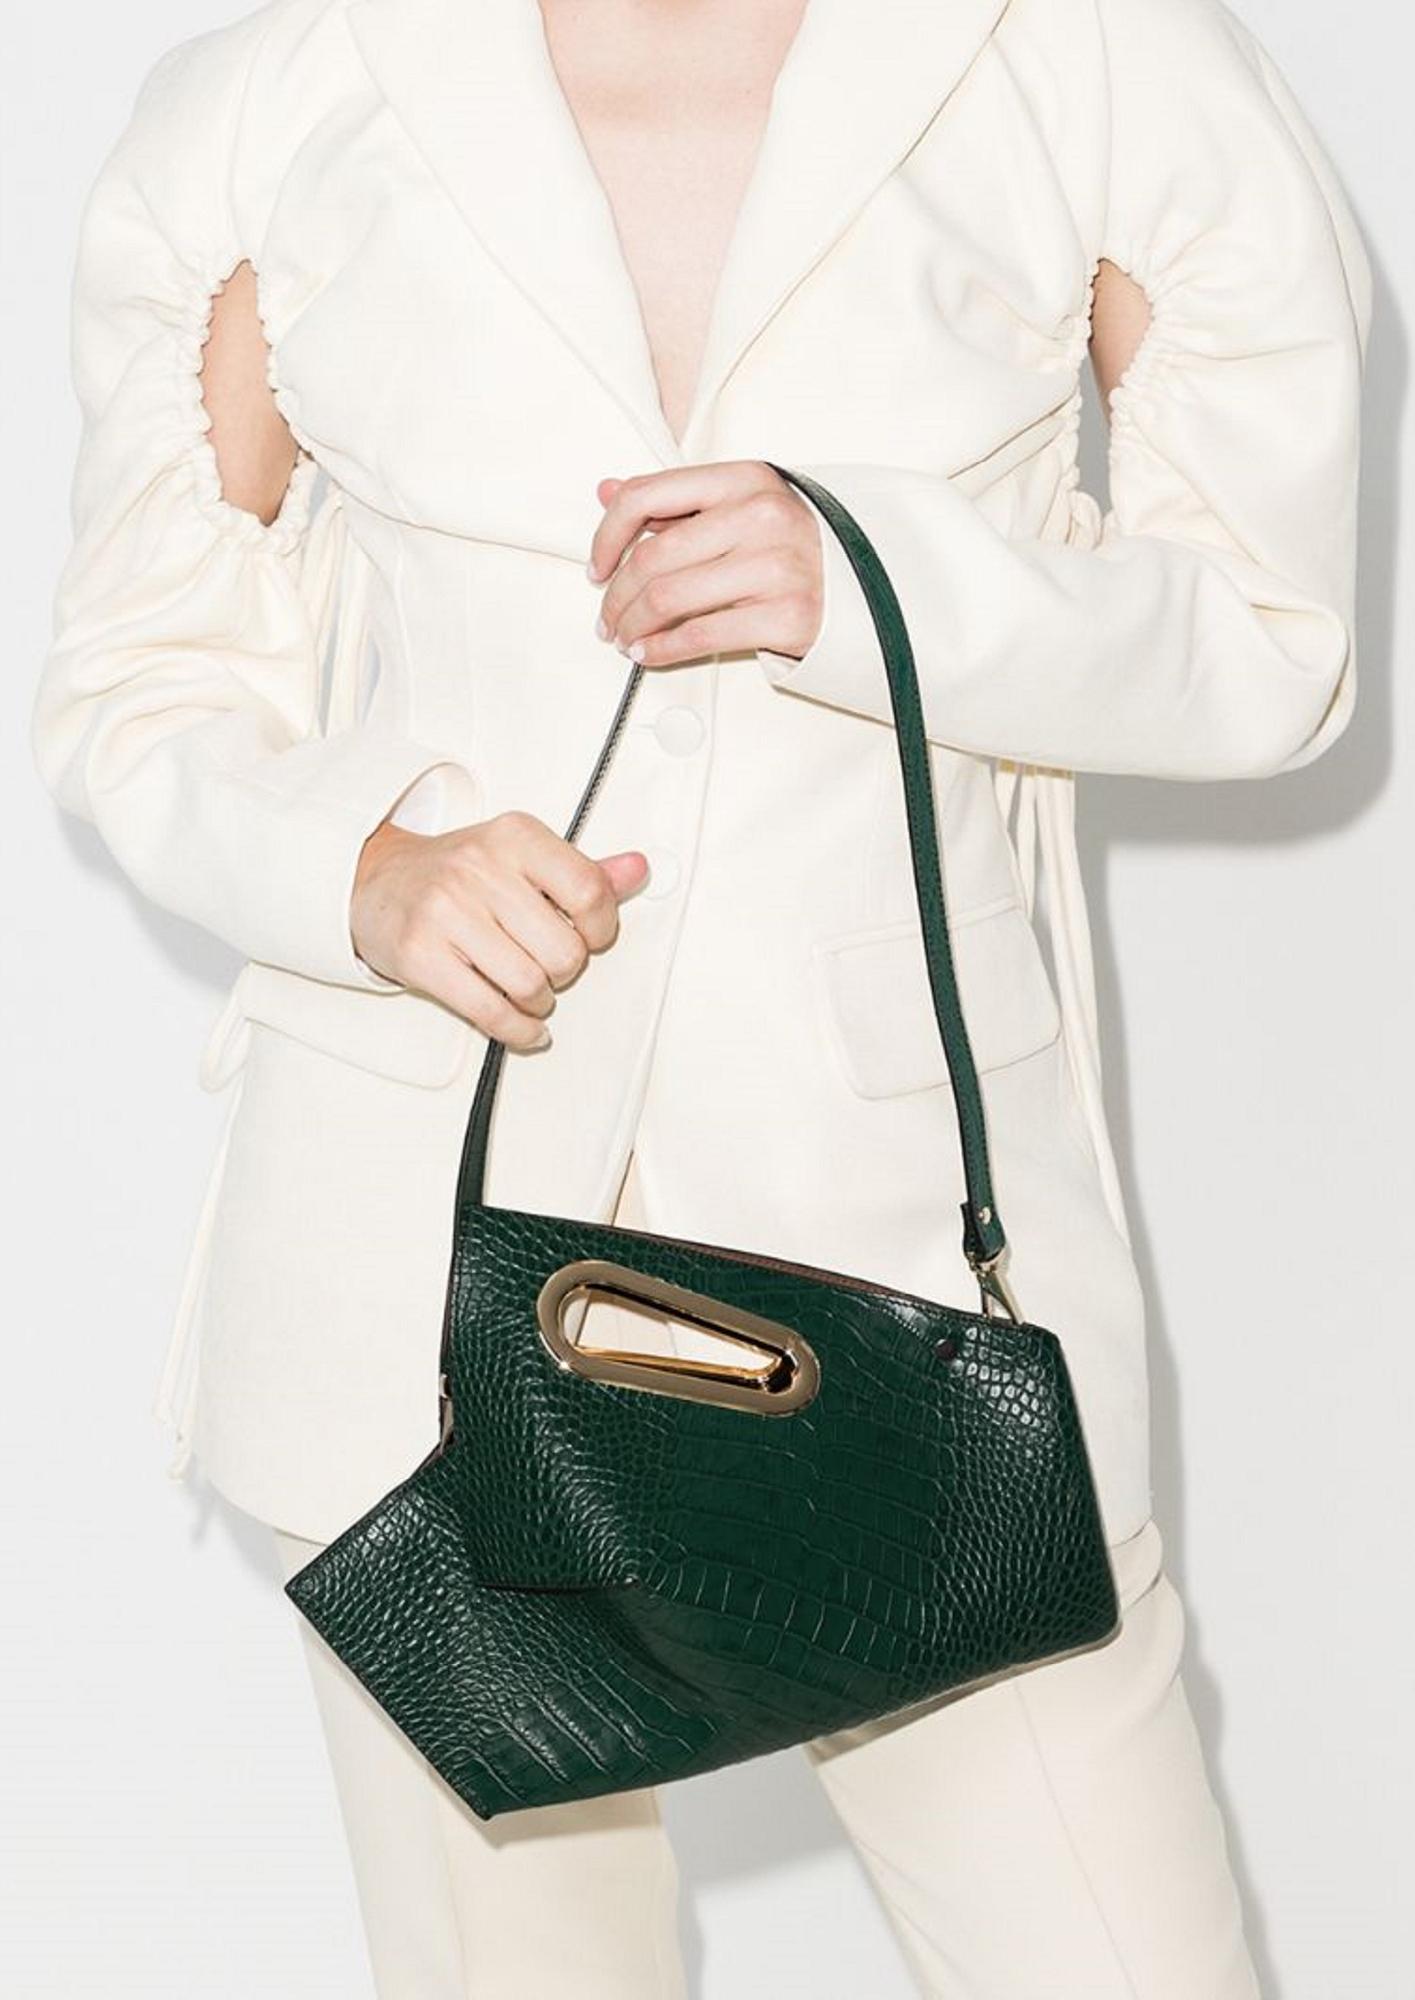 Khaore handbag